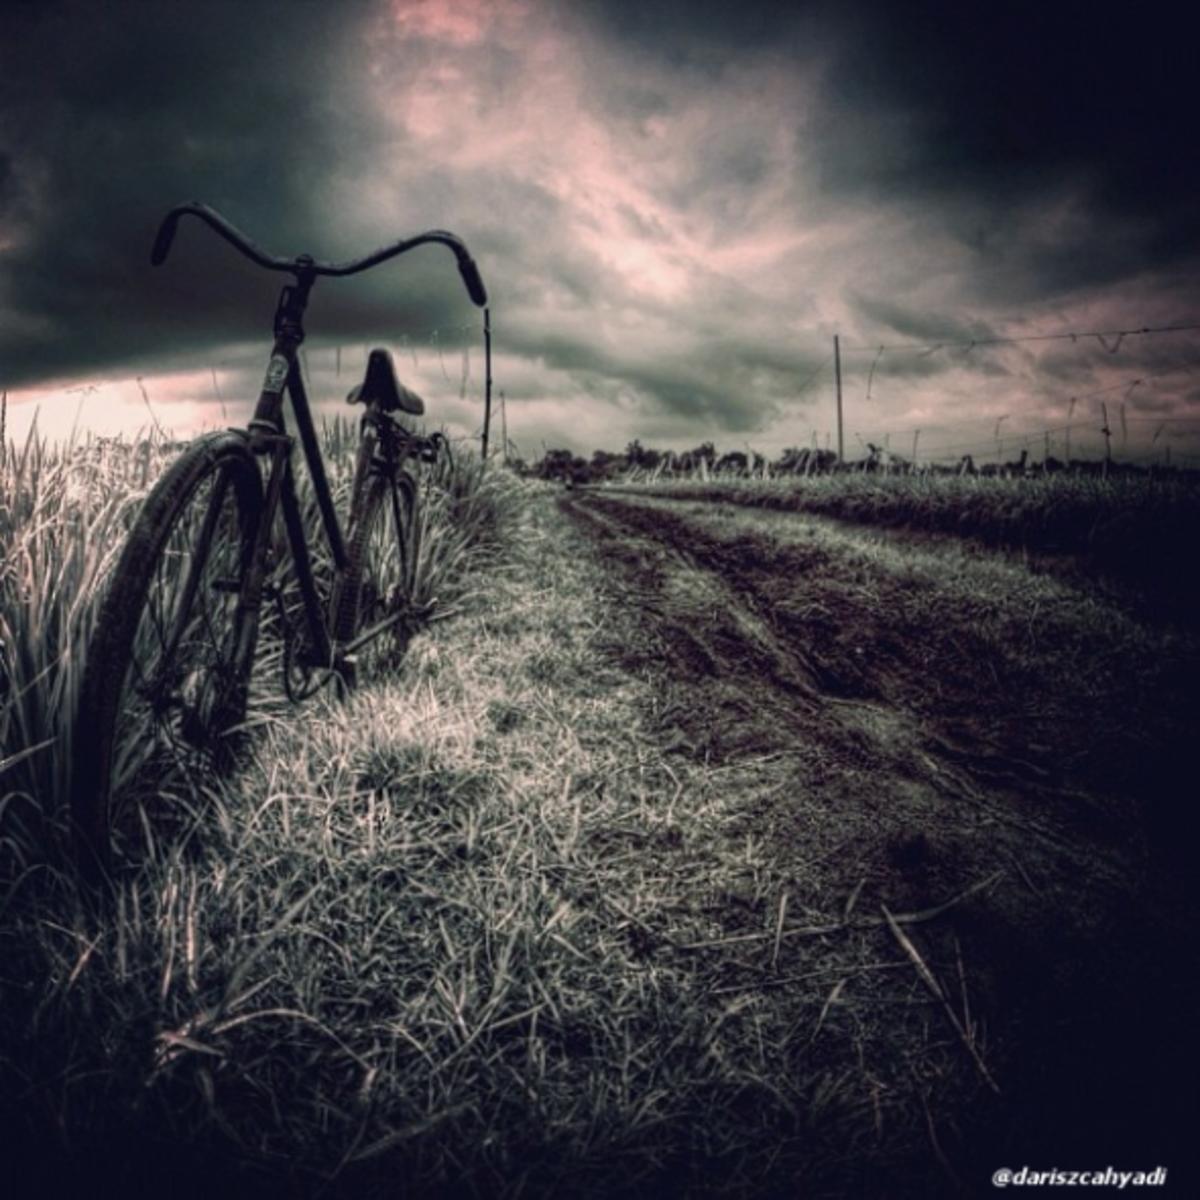 dariszcahyadi photographer on Instagram